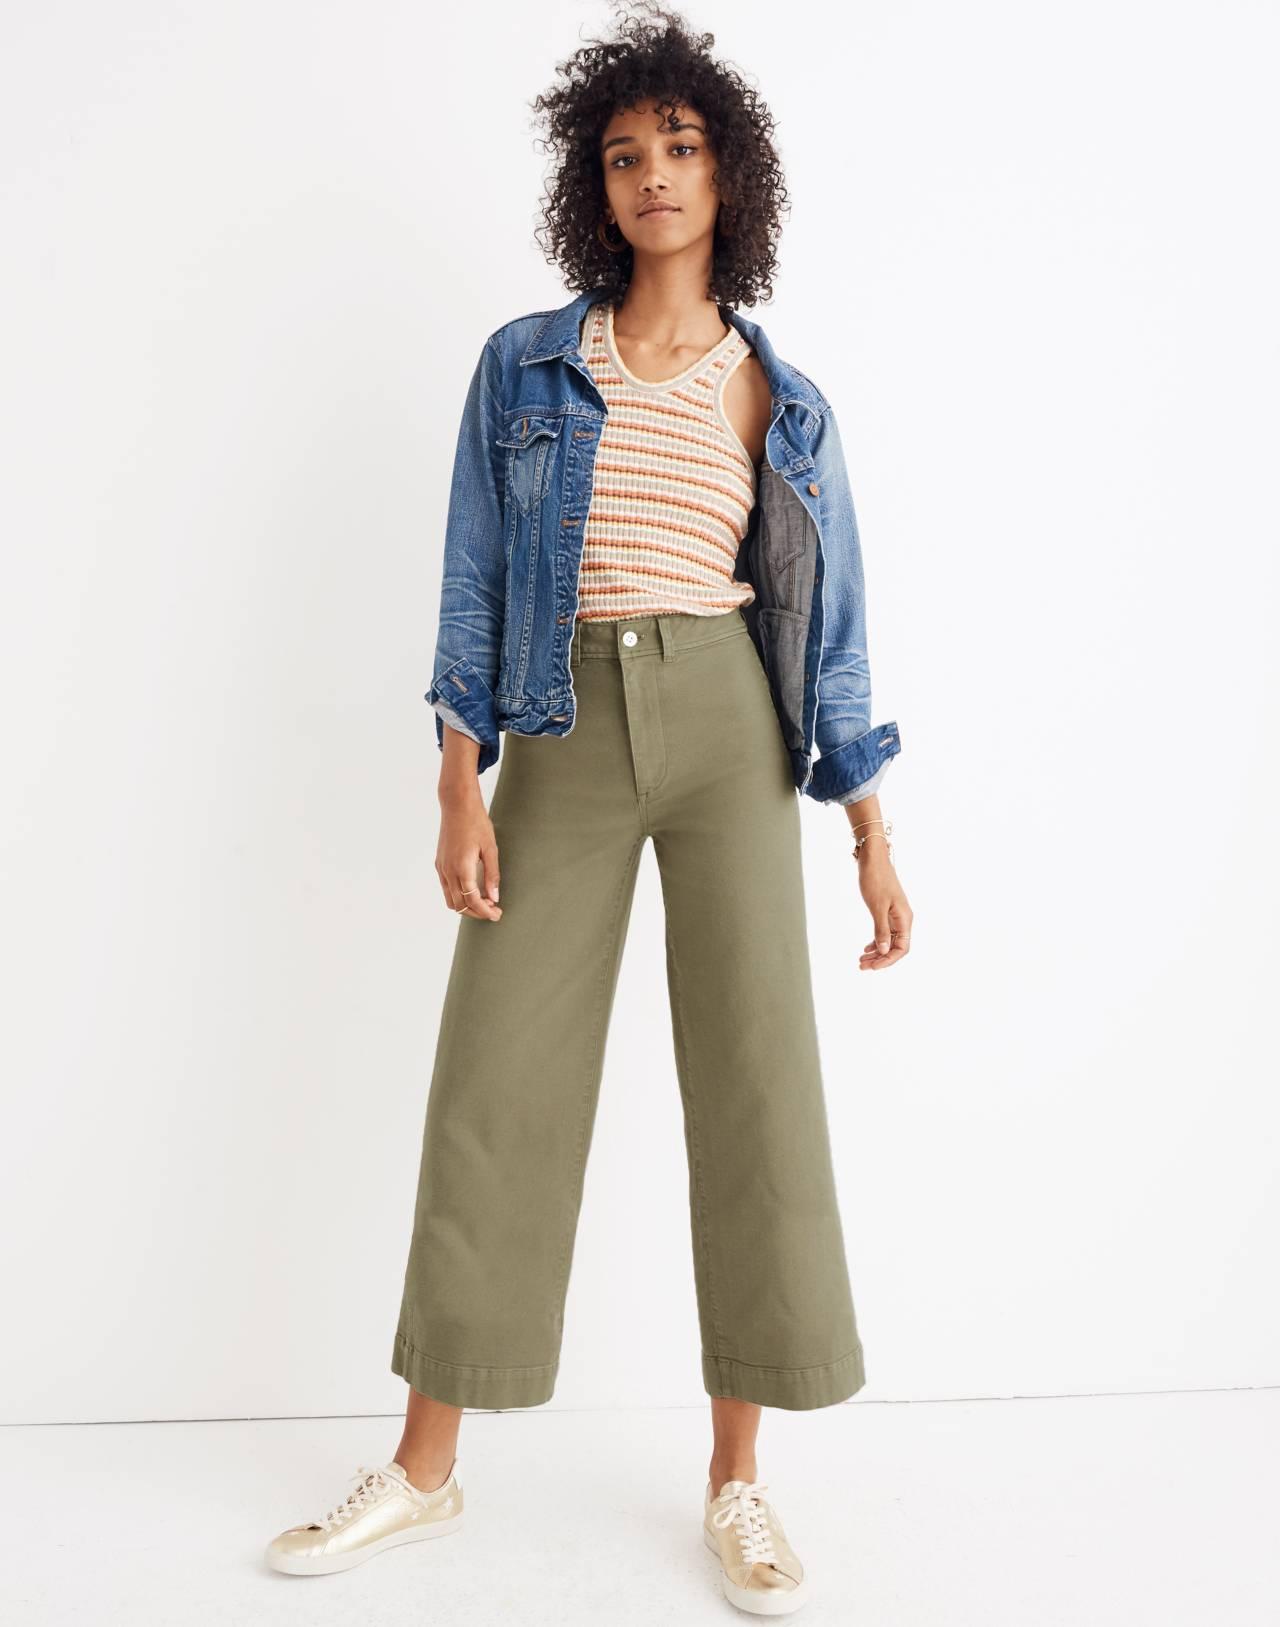 Emmett Wide-Leg Crop Pants in british surplus image 1